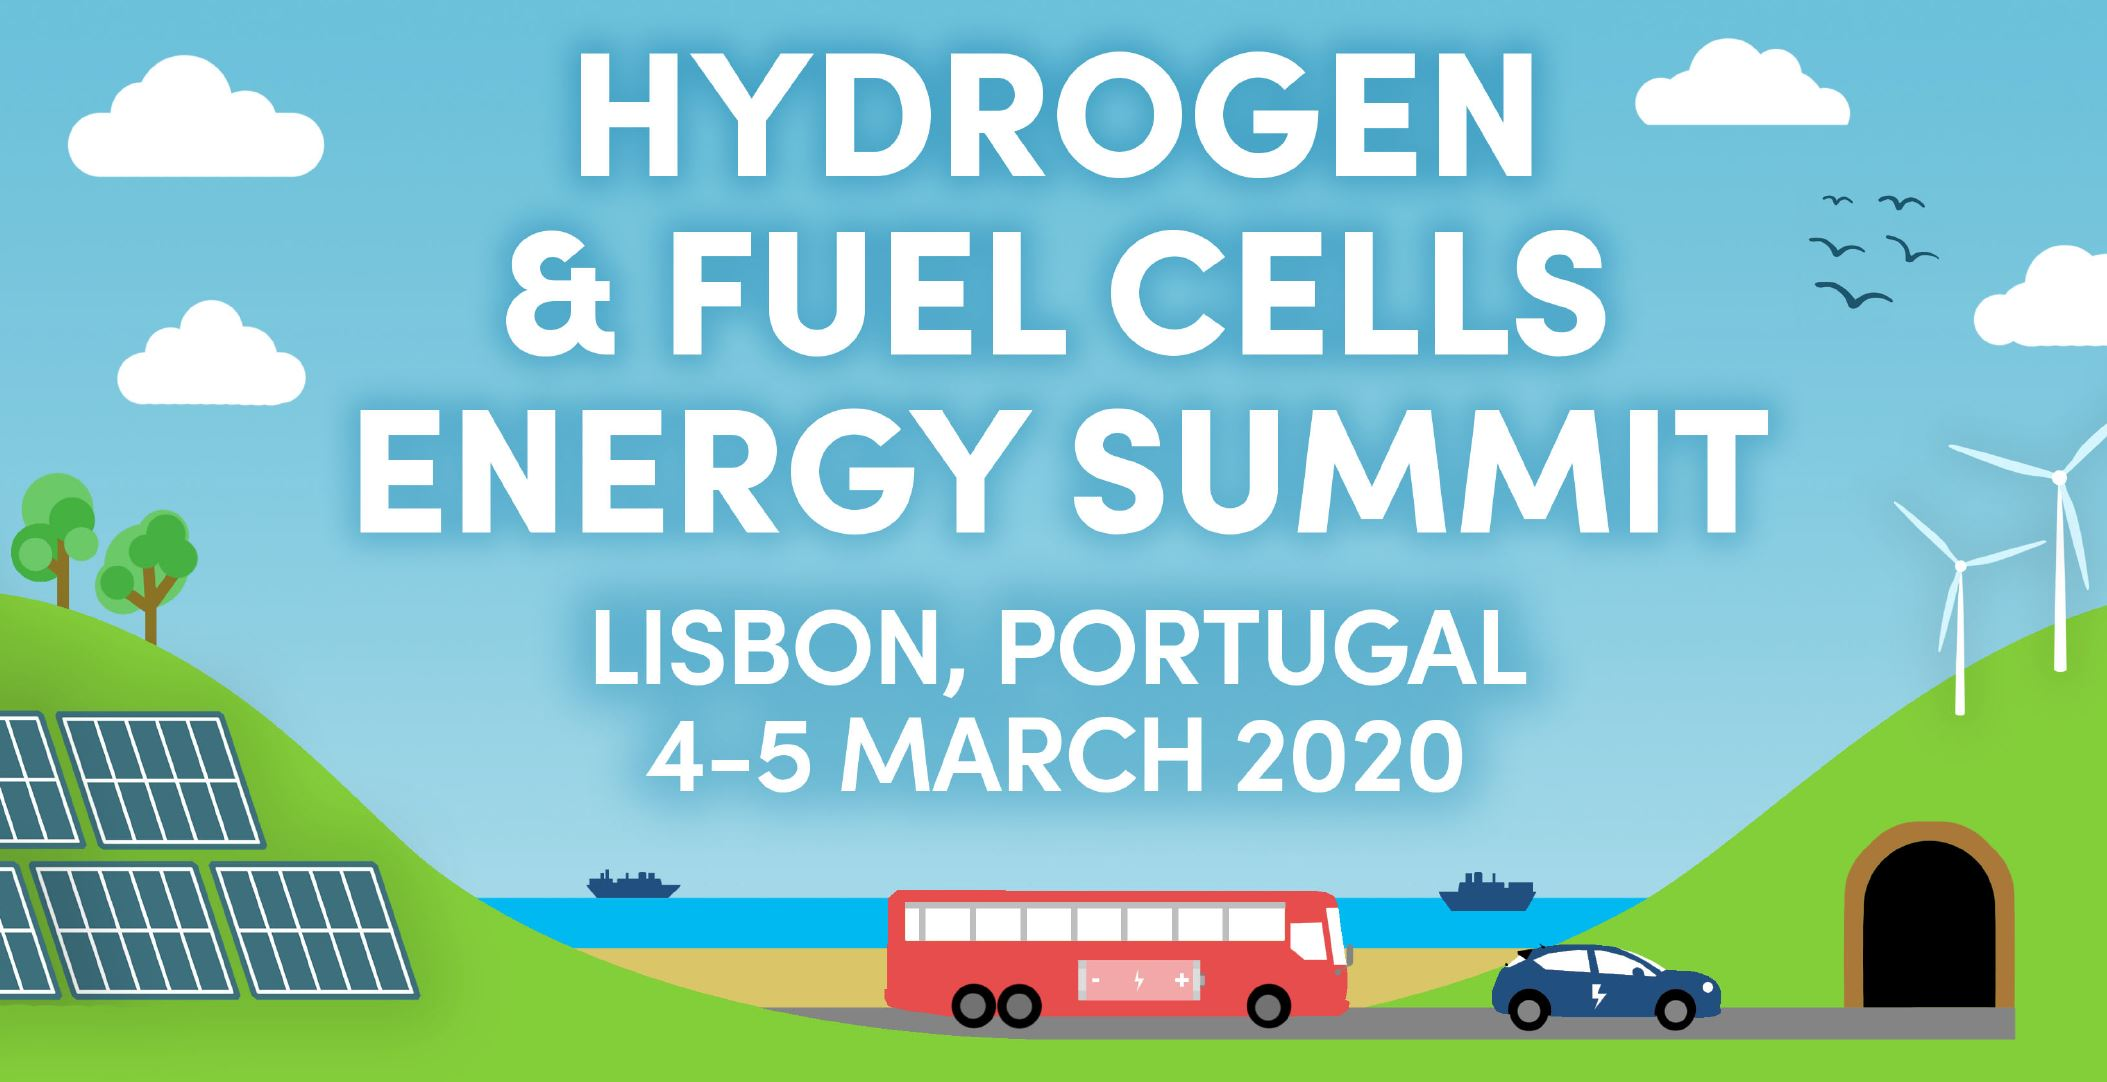 Hydrogen & Fuel Cells Energy Summit 2020